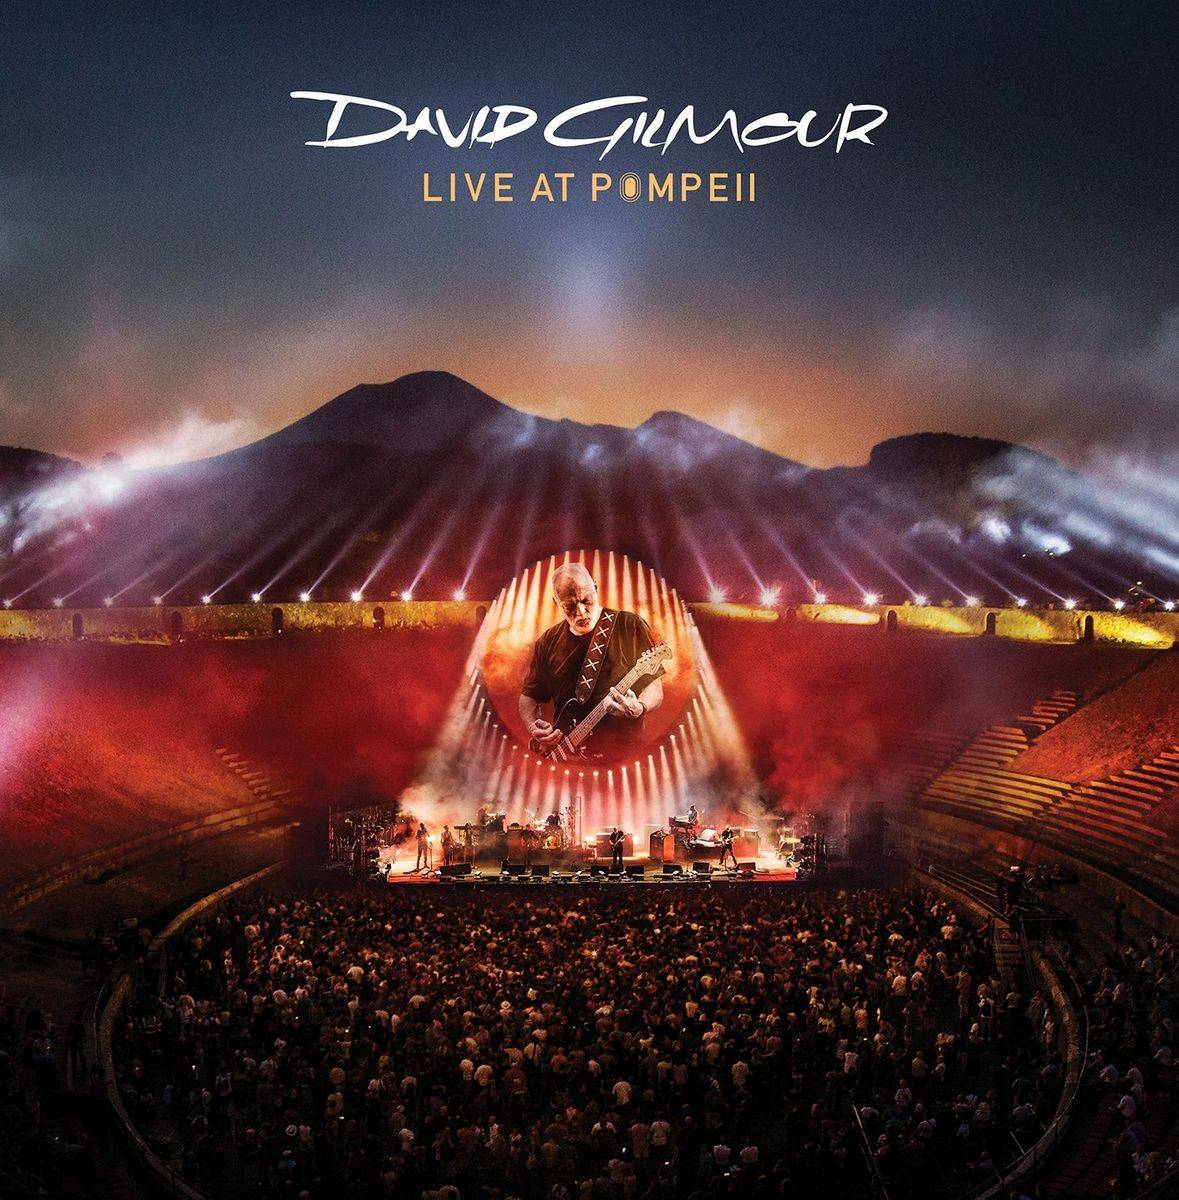 Colombia Records Disques vinyle Pop Rock Columbia Records David Gilmour - Live At Pompeii (4 LP)